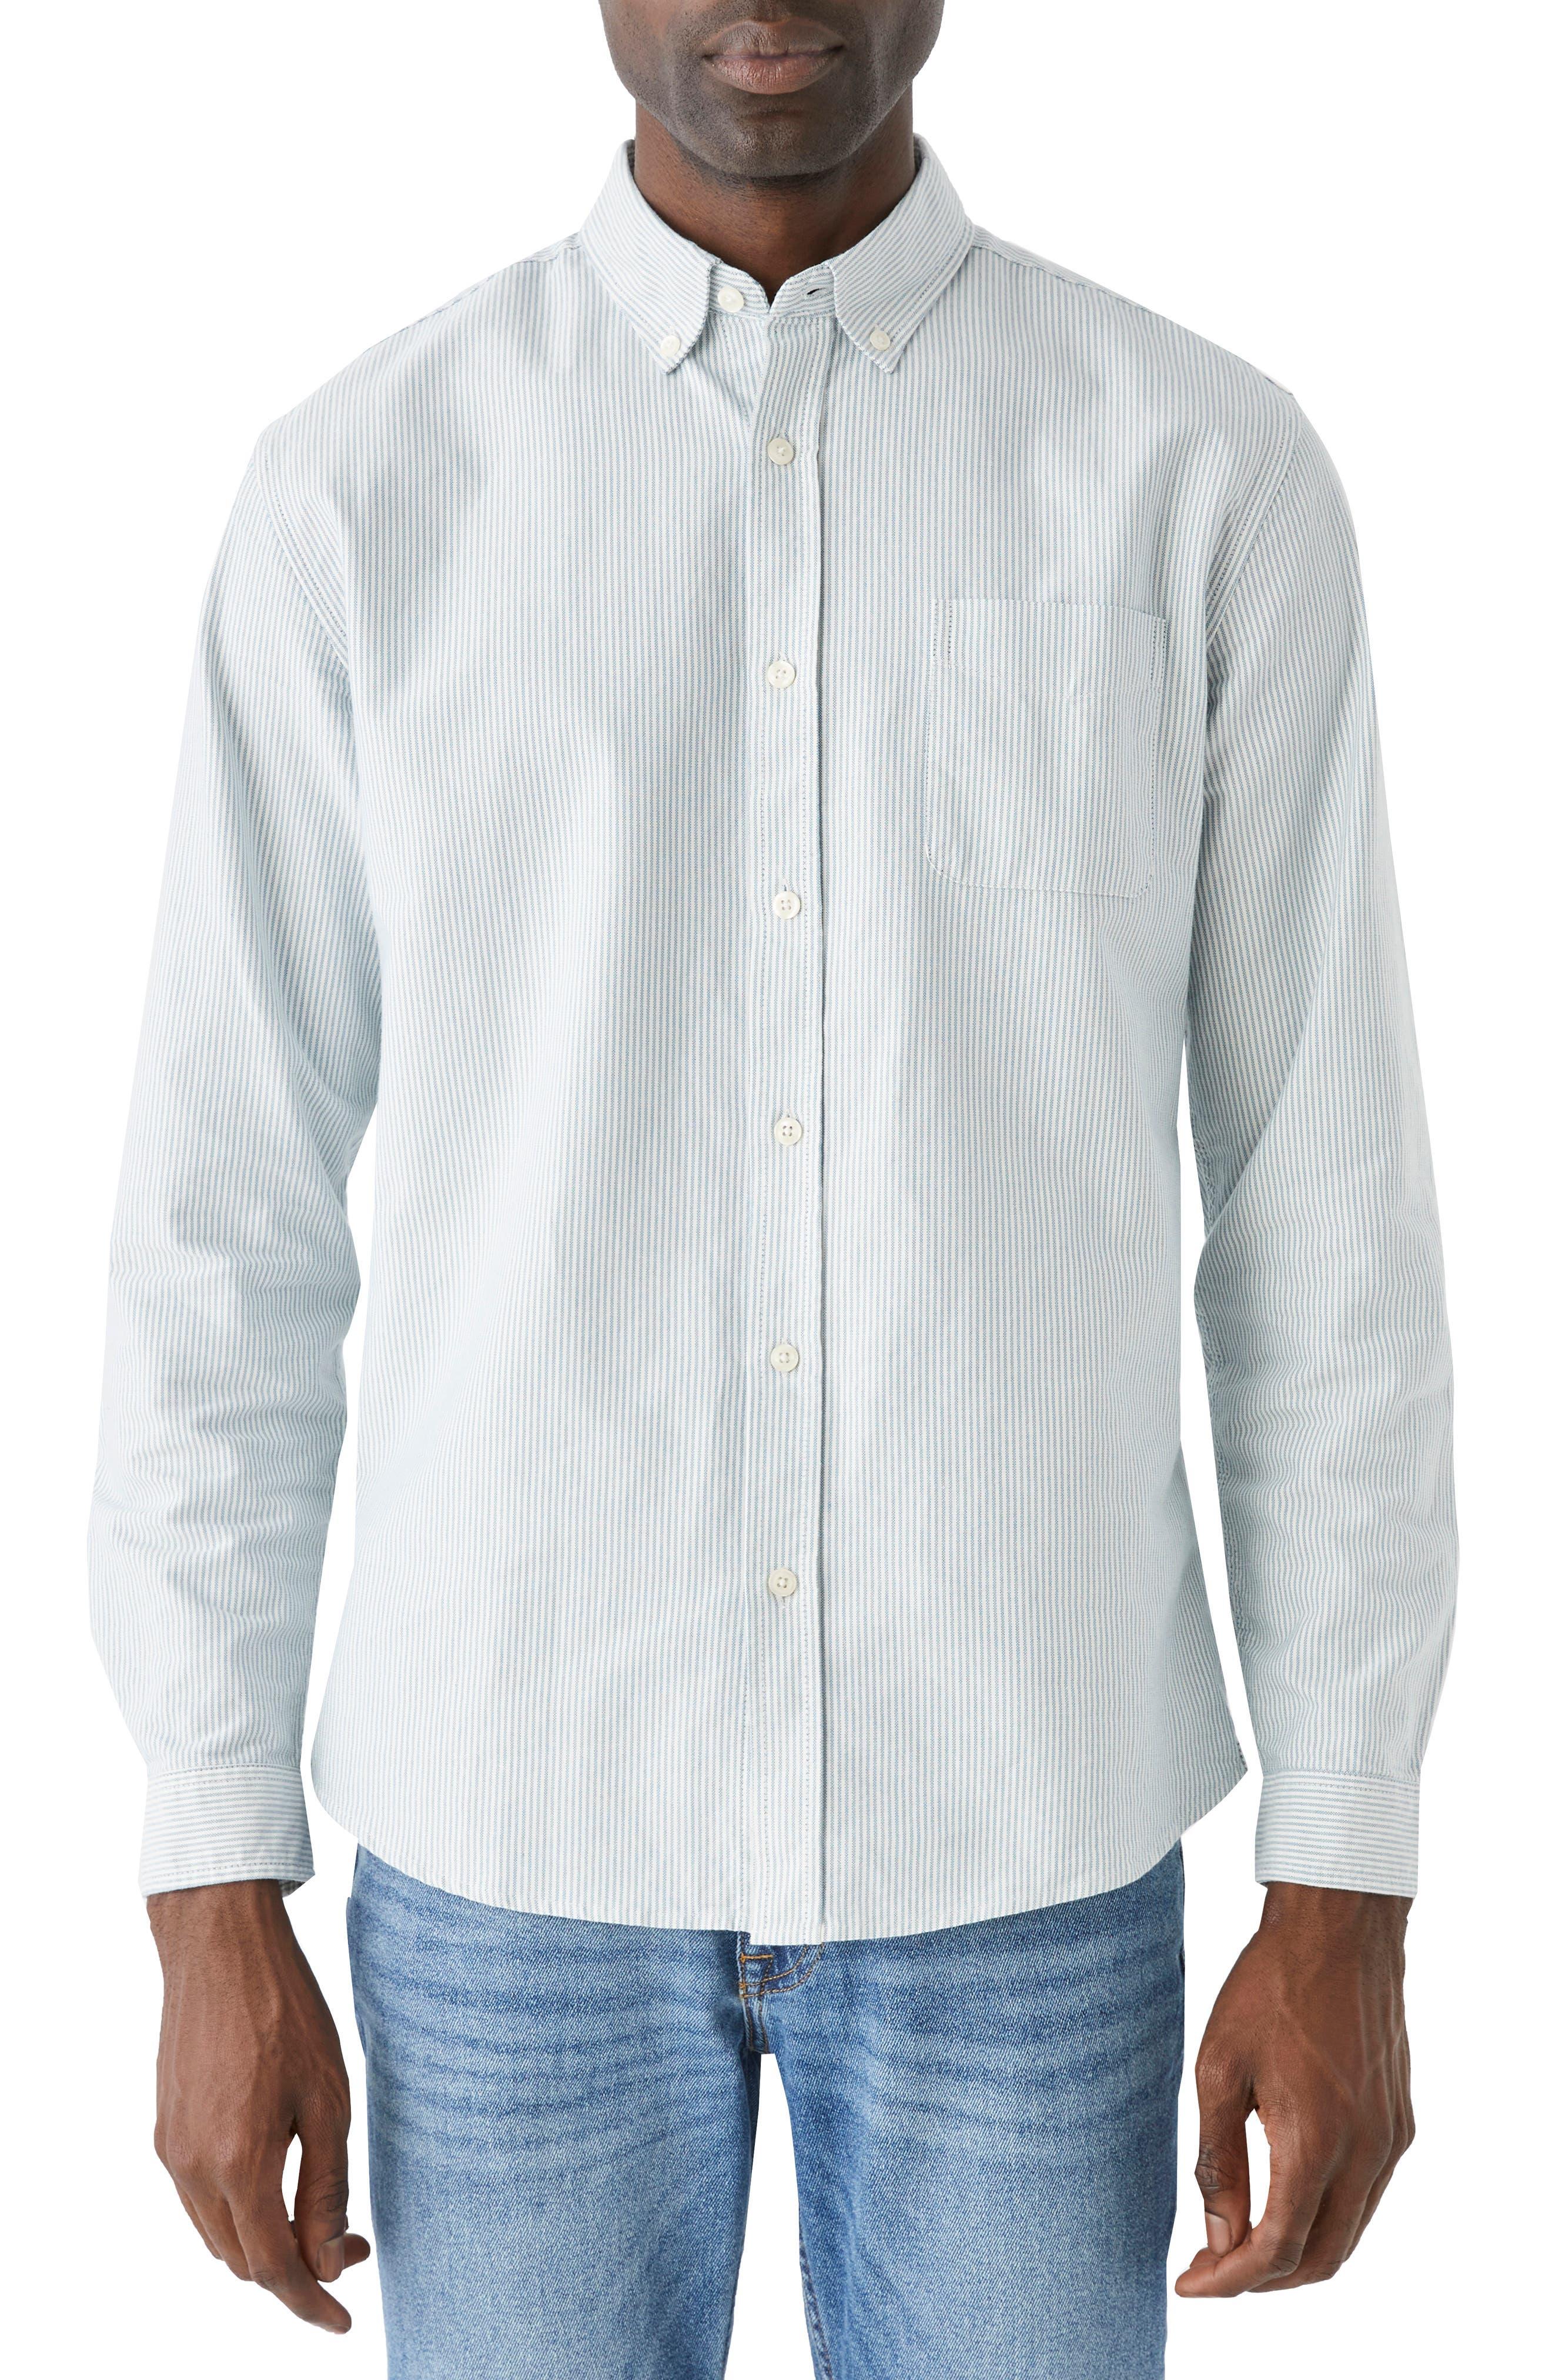 Stripe Jasper Organic Cotton Blend Button-Down Shirt